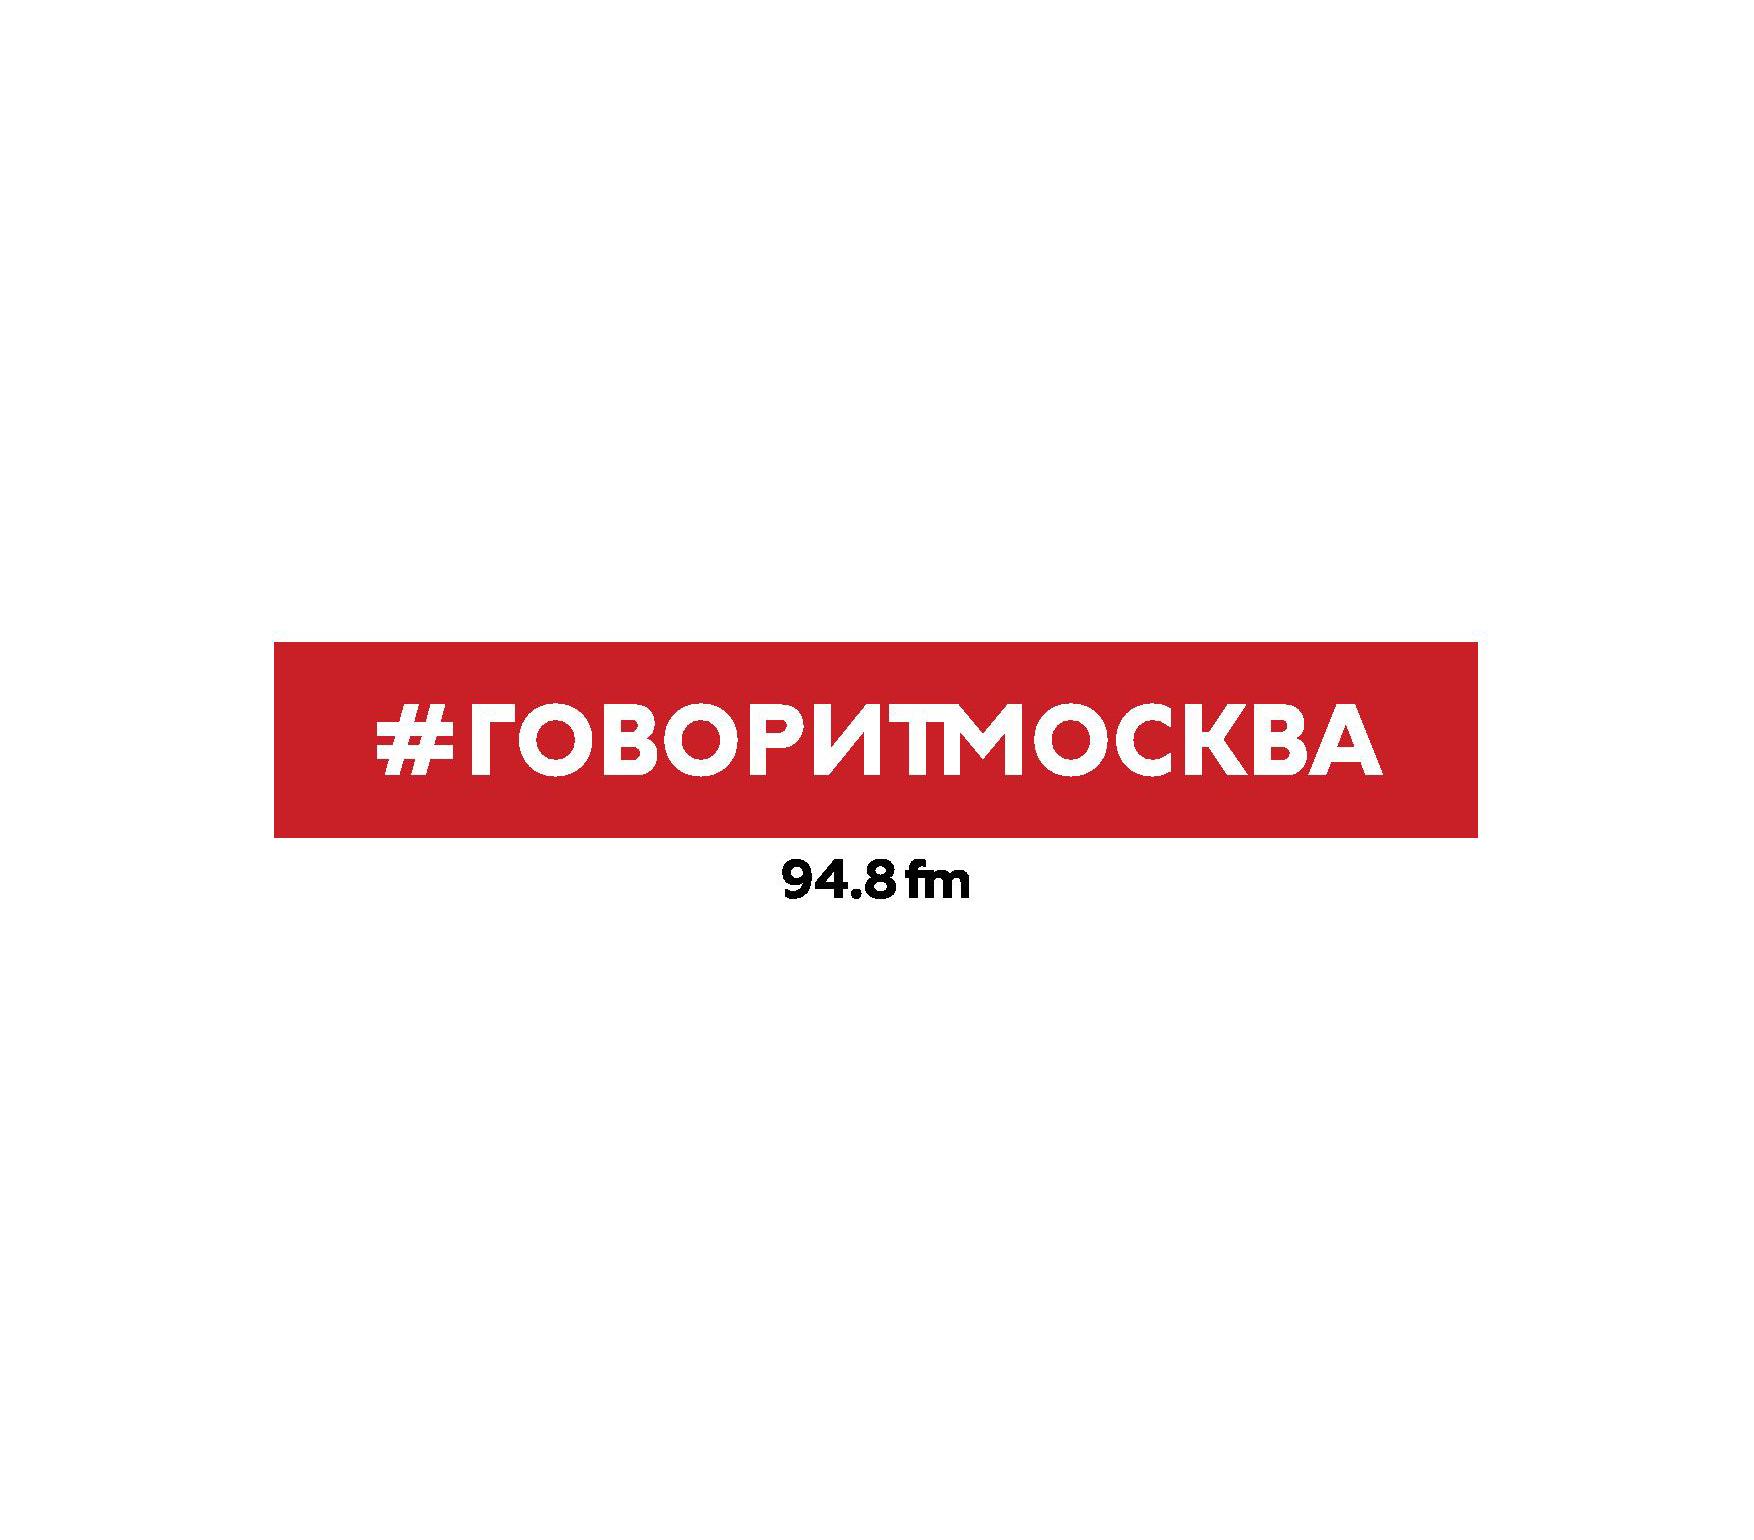 Макс Челноков 31 марта. Ирина Богушевская макс челноков 5 мая марат гельман